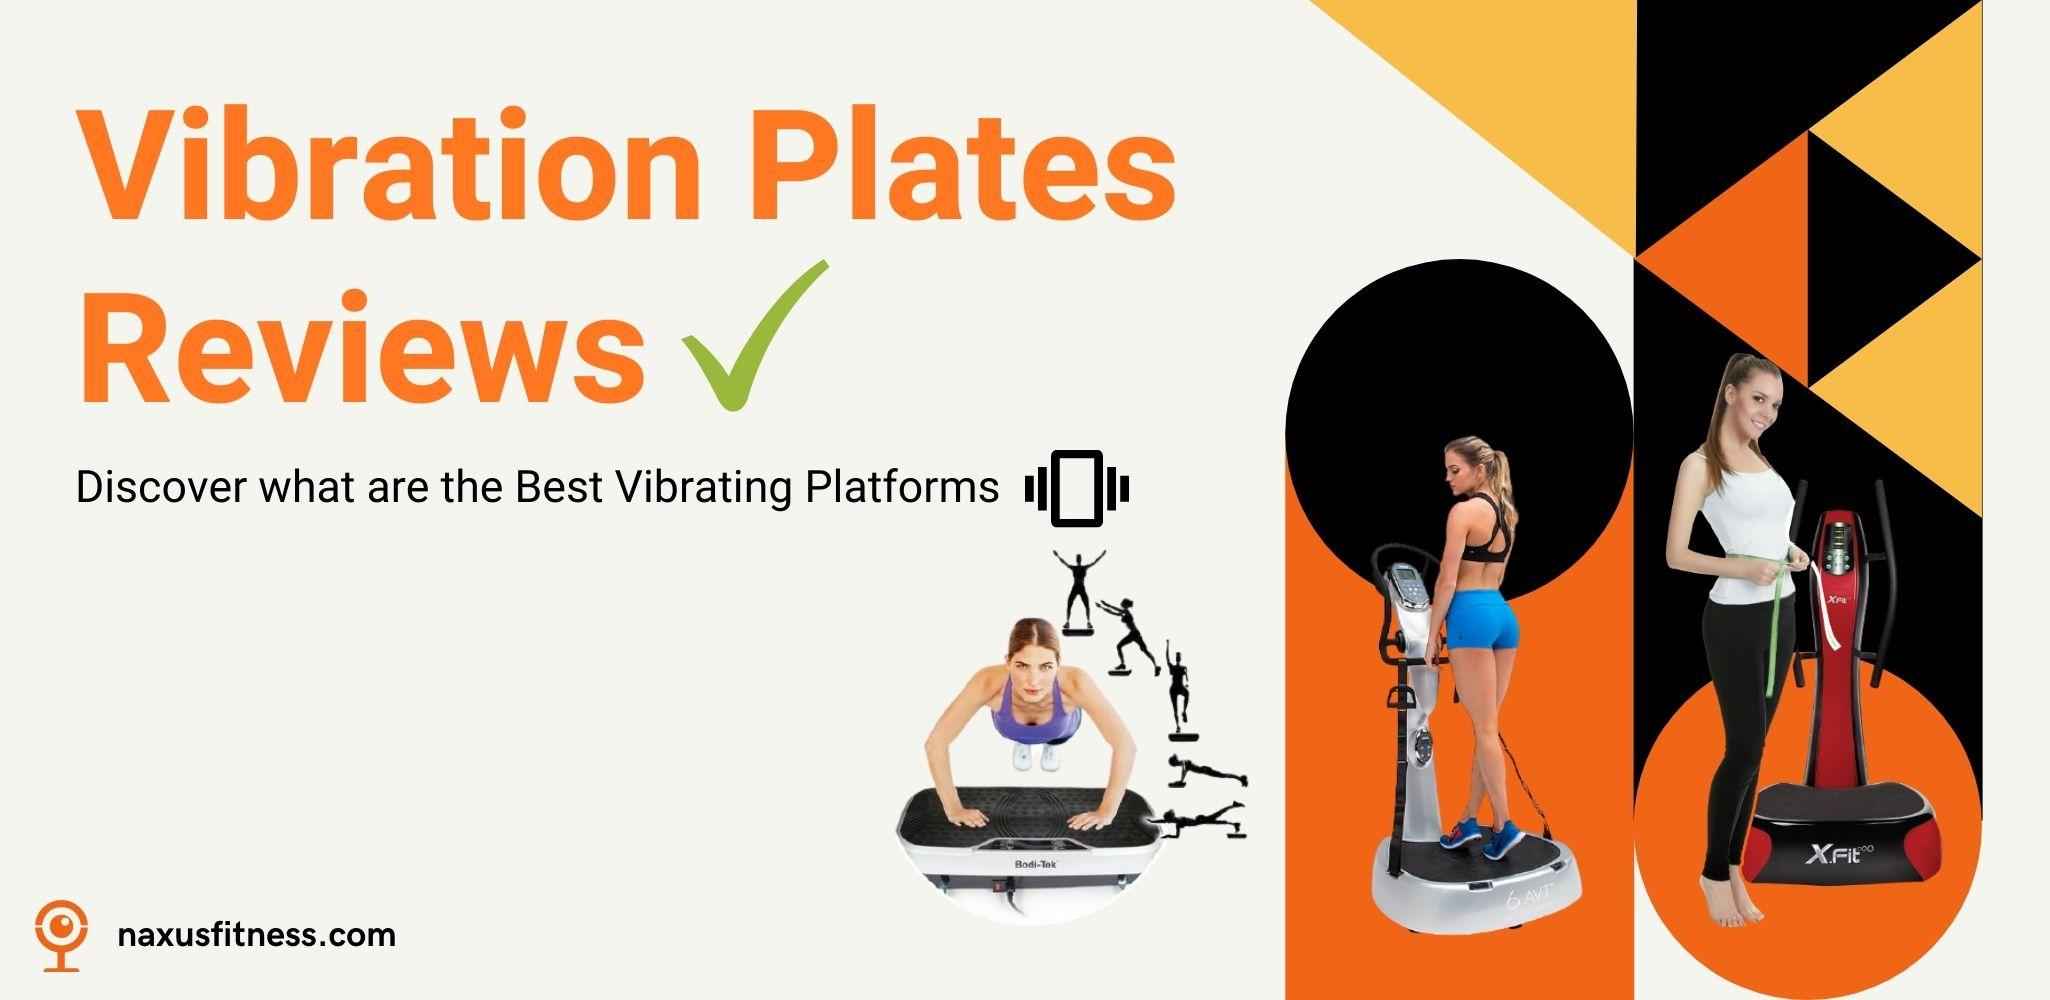 Vibration plates reviews